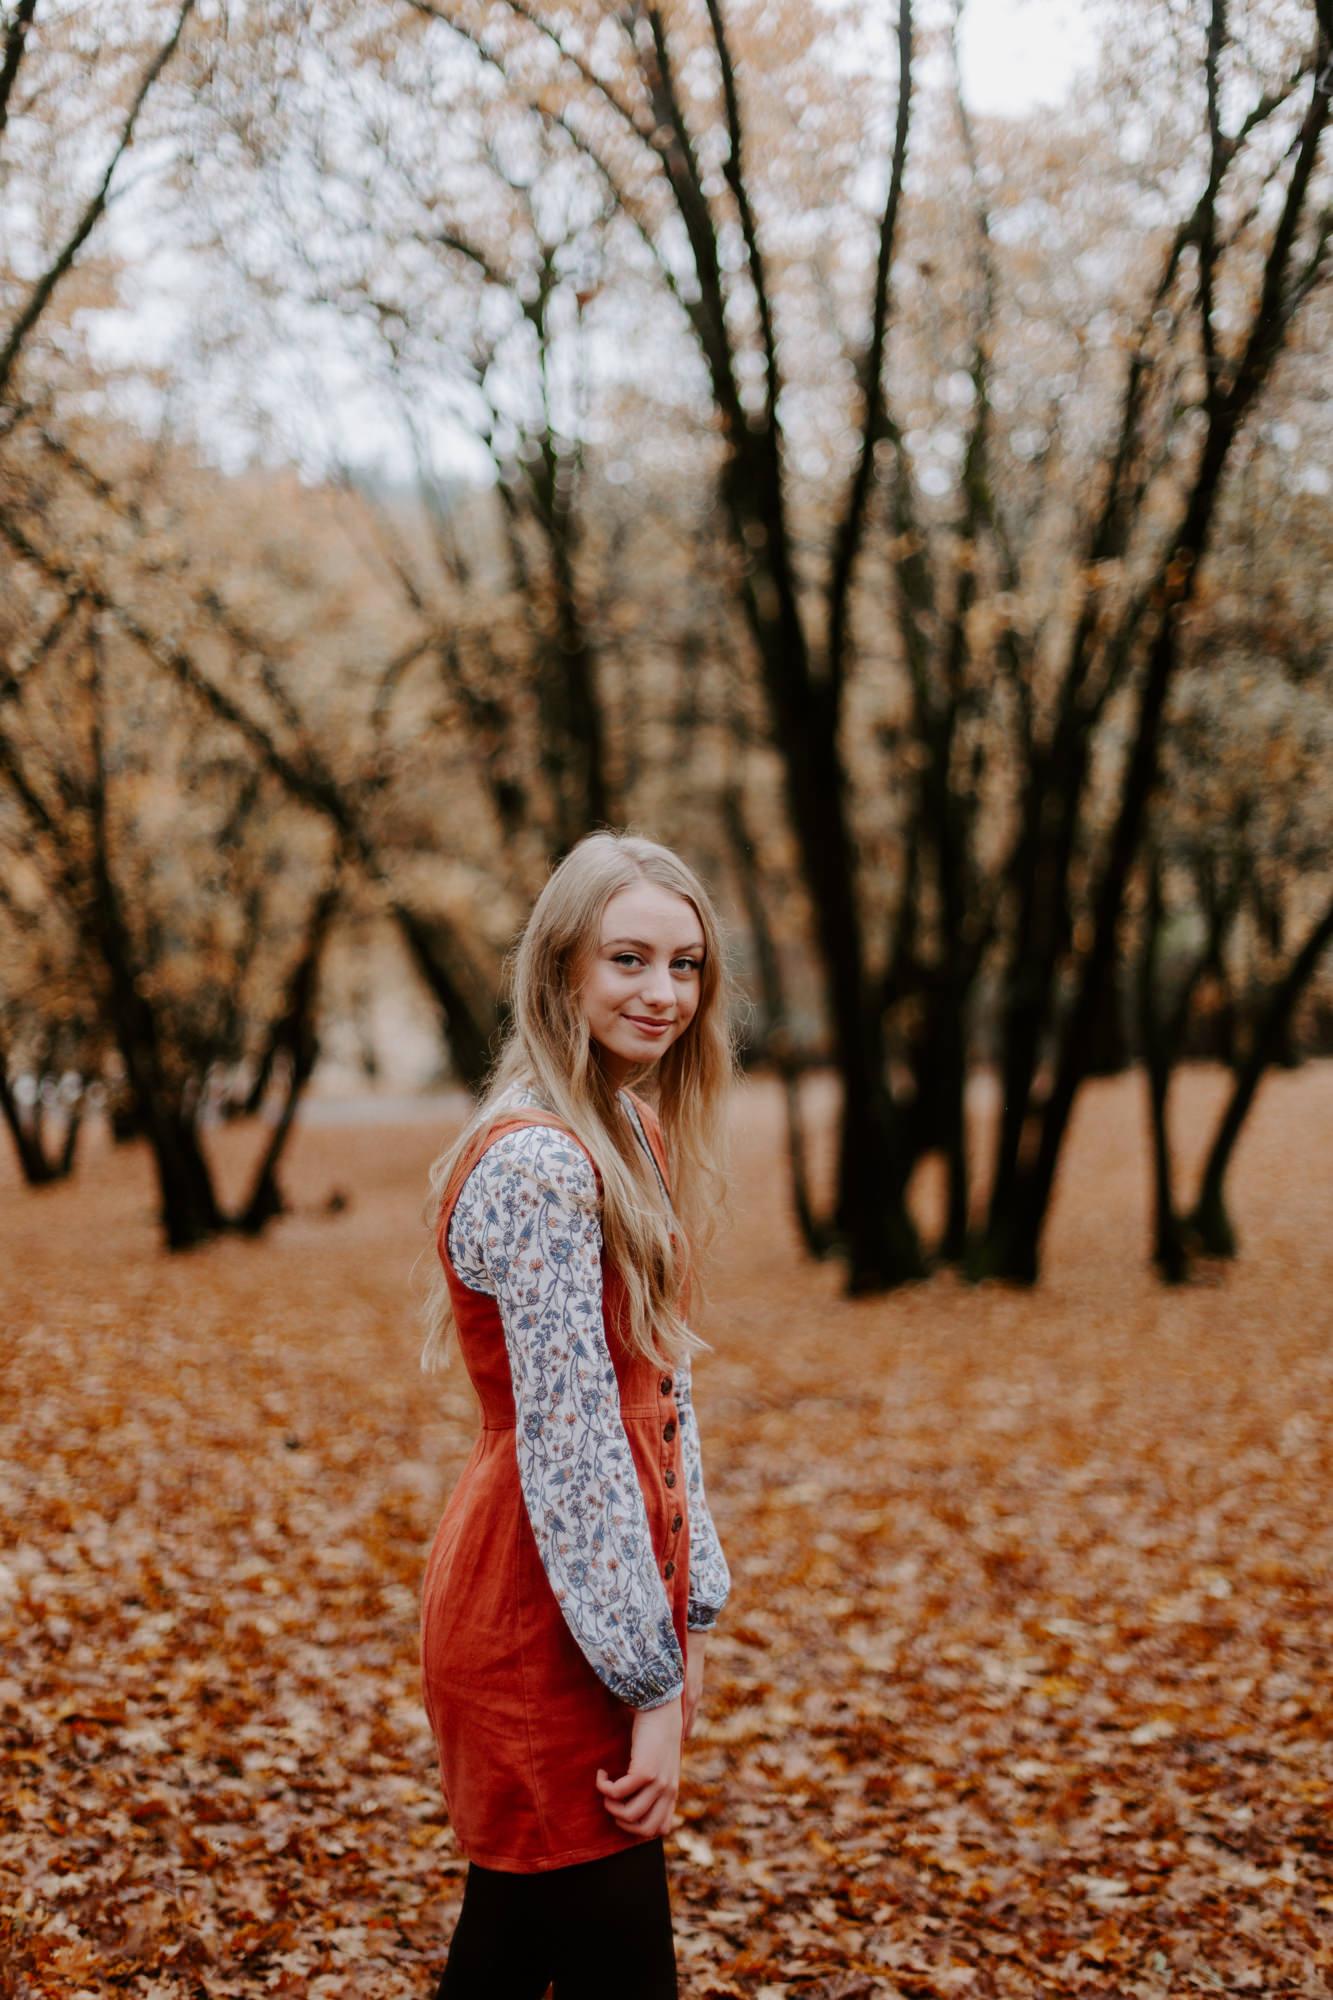 San Diego Portrait photography at Lake Tahoe014.jpg